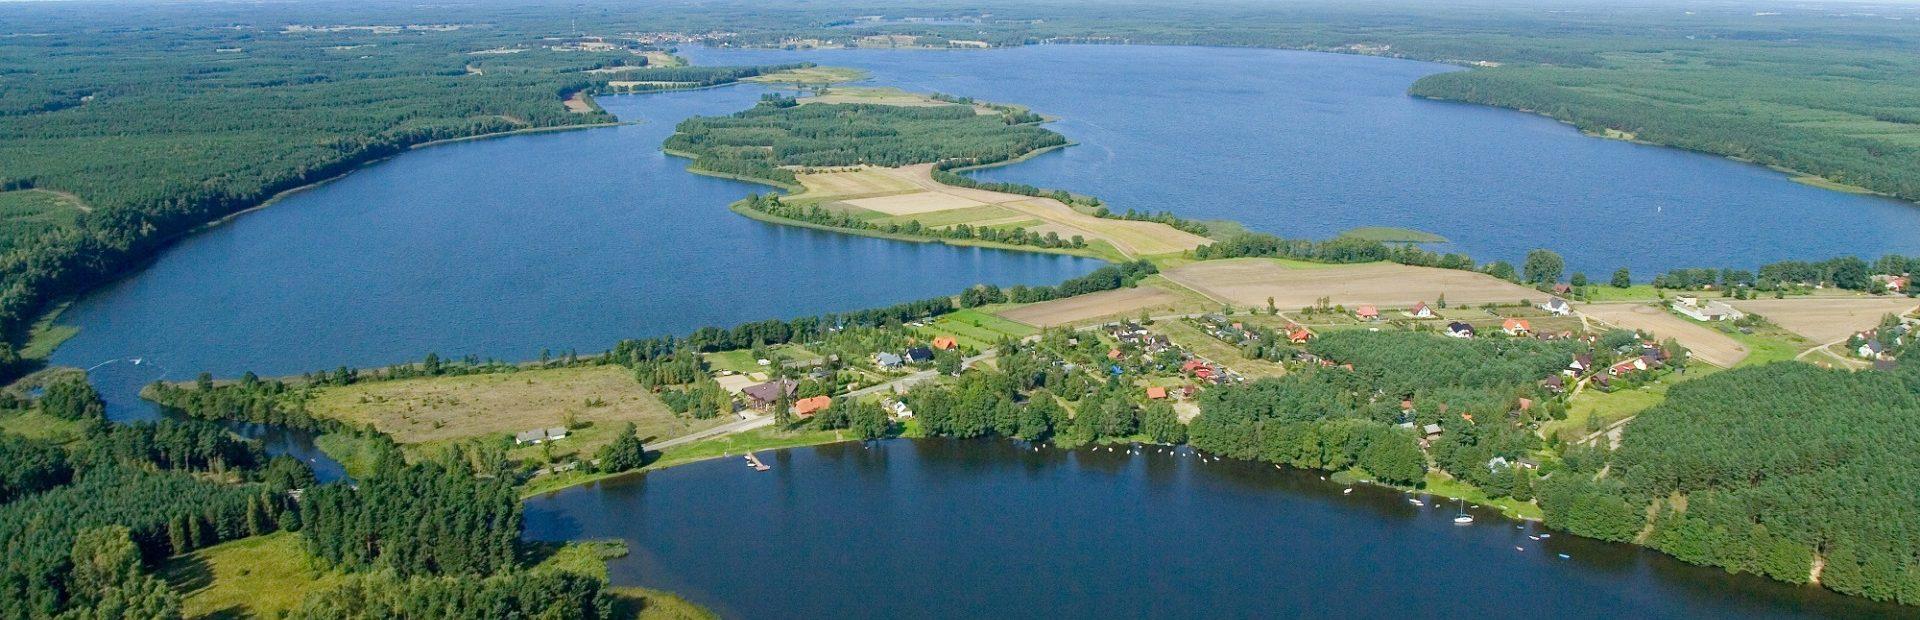 Zaborski Park Krajobrazowy